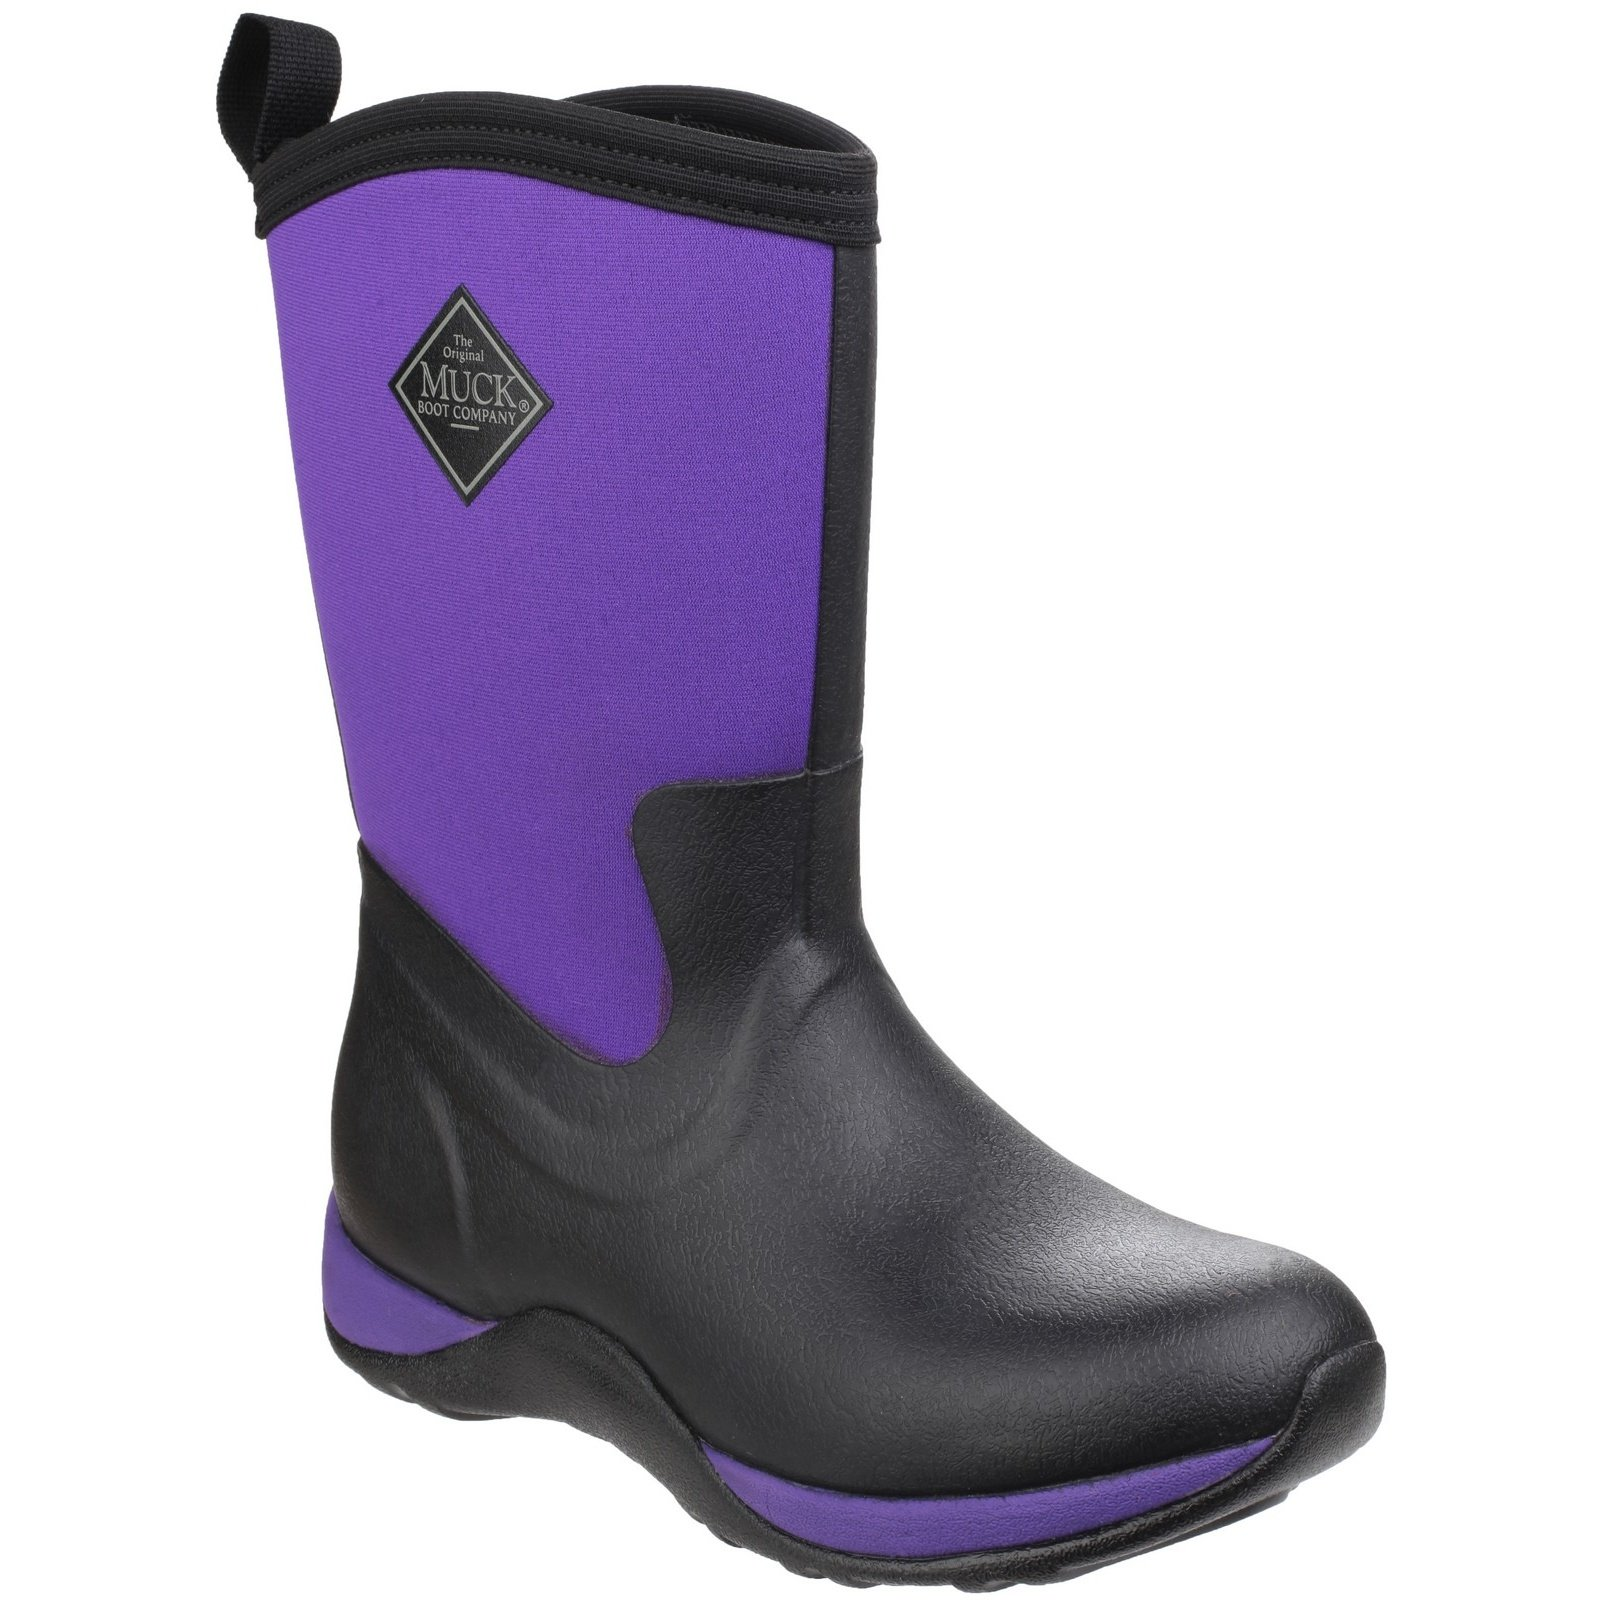 Muck Boot Unisex Arctic Weekend Pull on Wellington Boots (4 M US/5 W US) (Black/Purple)